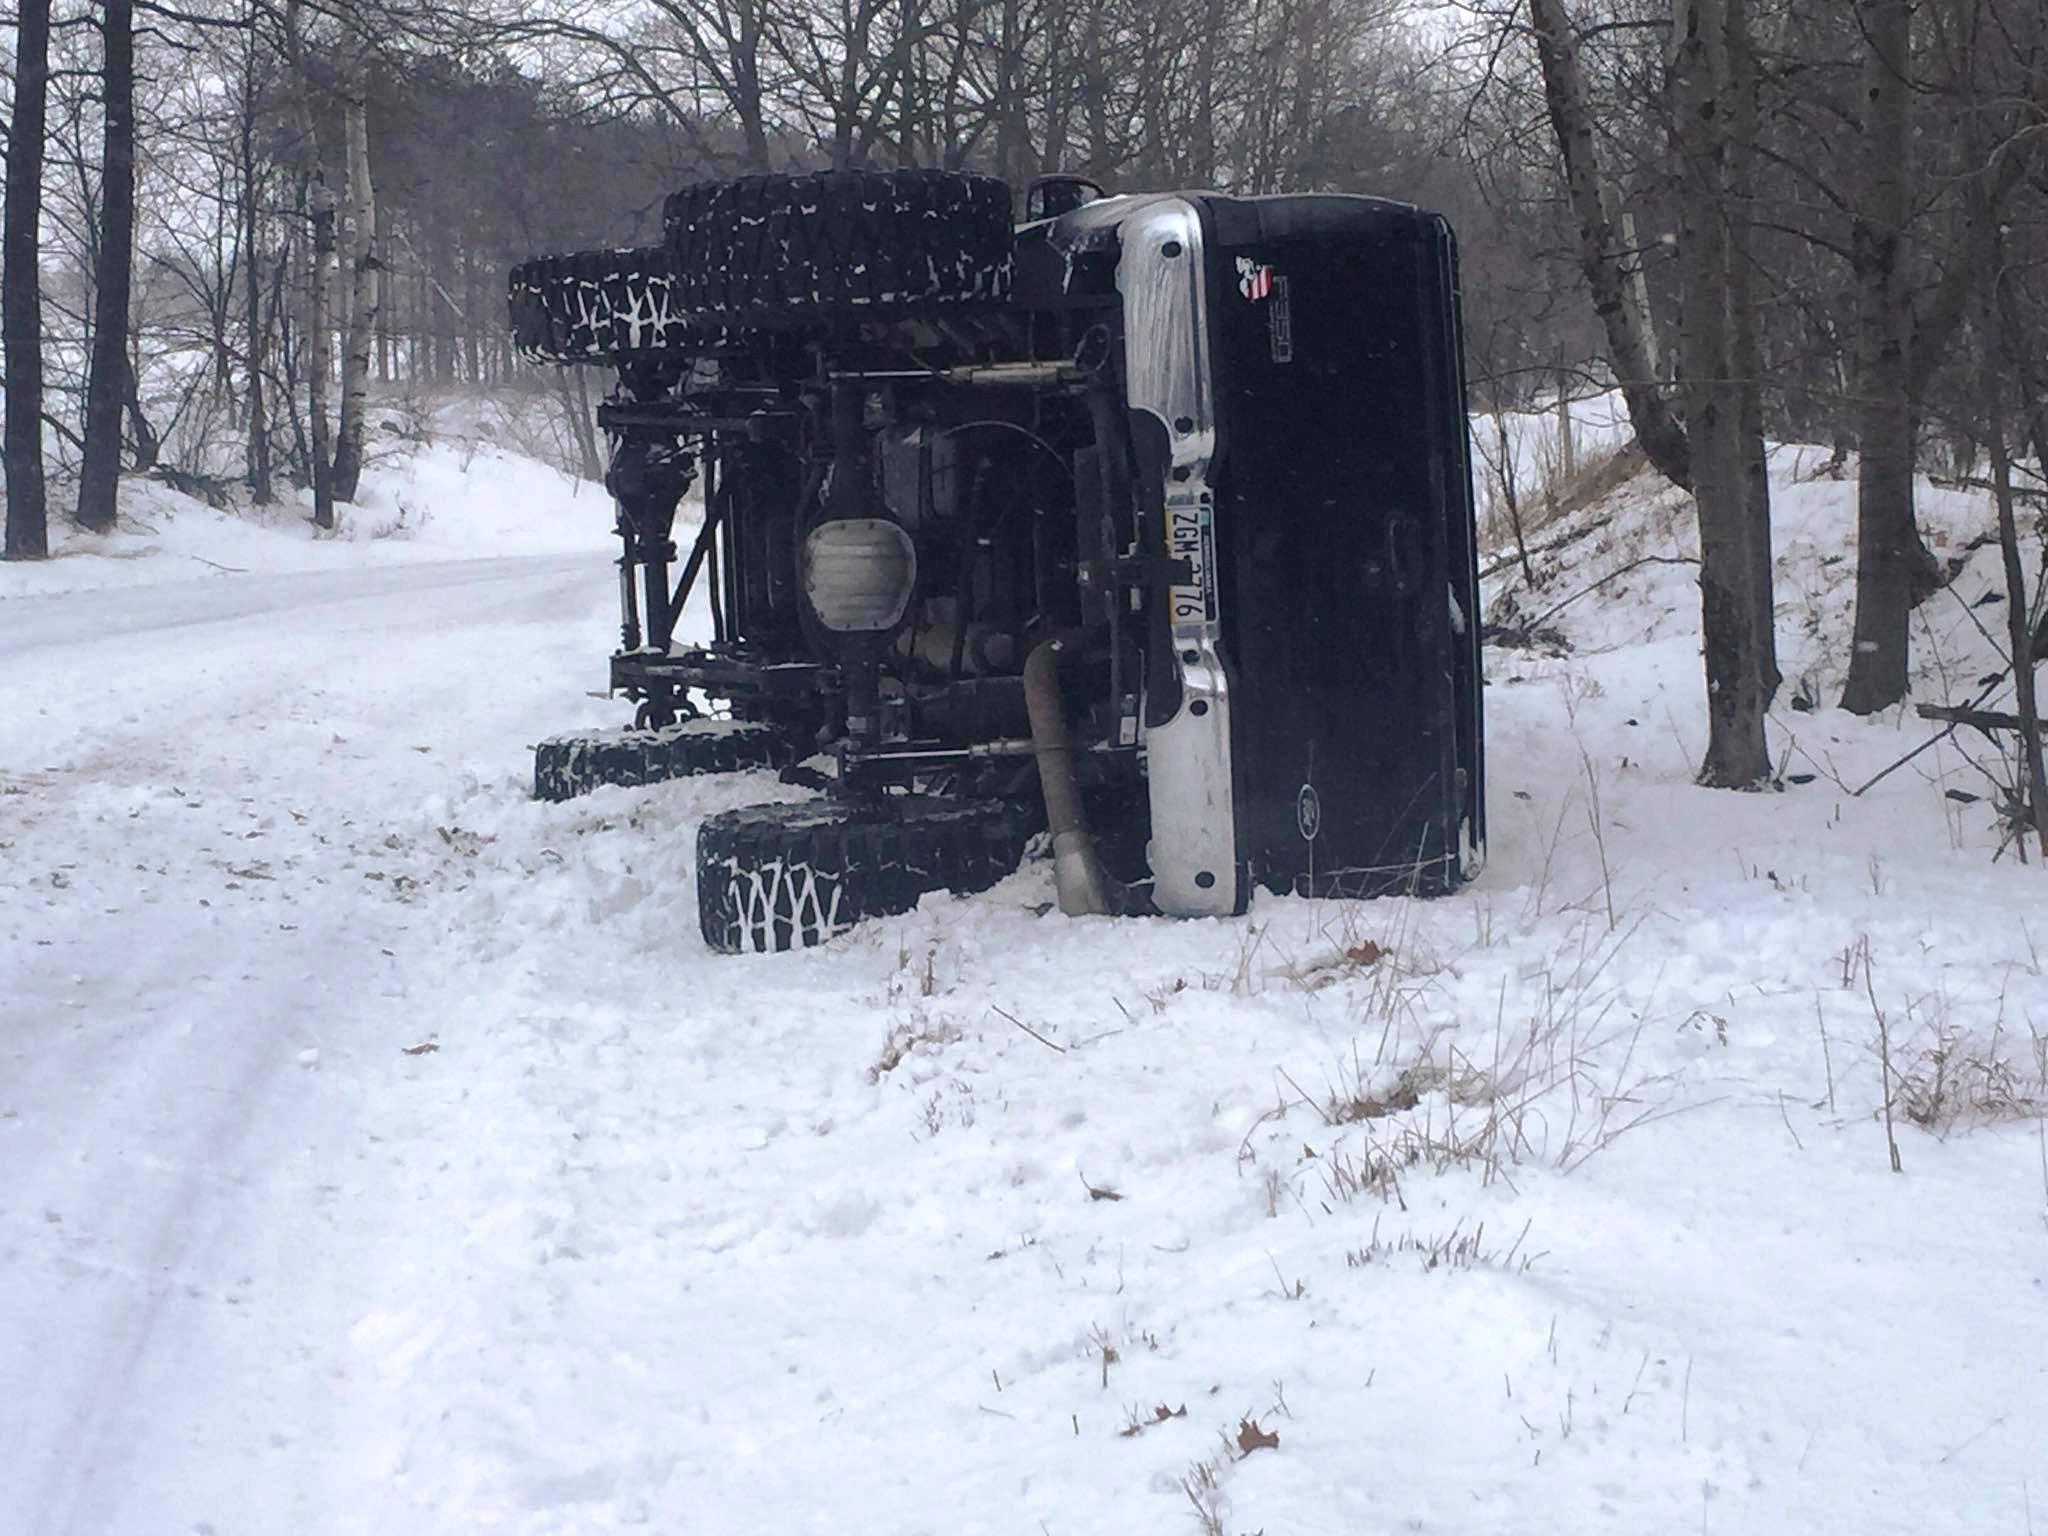 Overturned vehicle on Delano Road